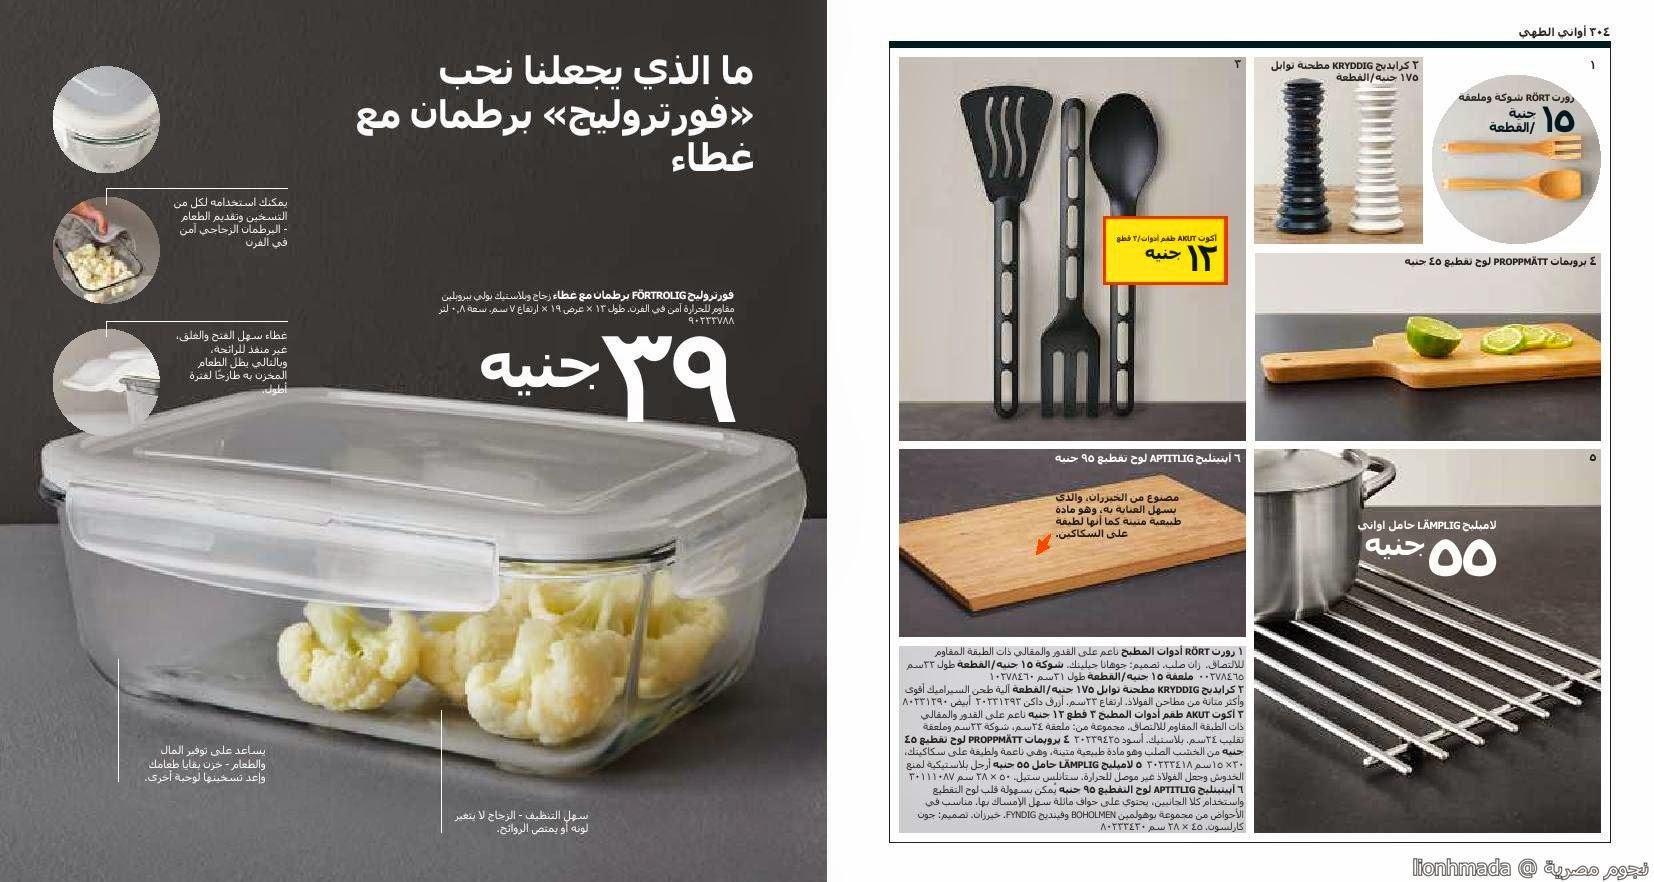 img9186c04c55495a6dcb6345cd50833248 صور كتالوج ايكيا مصر ikia للديكورات